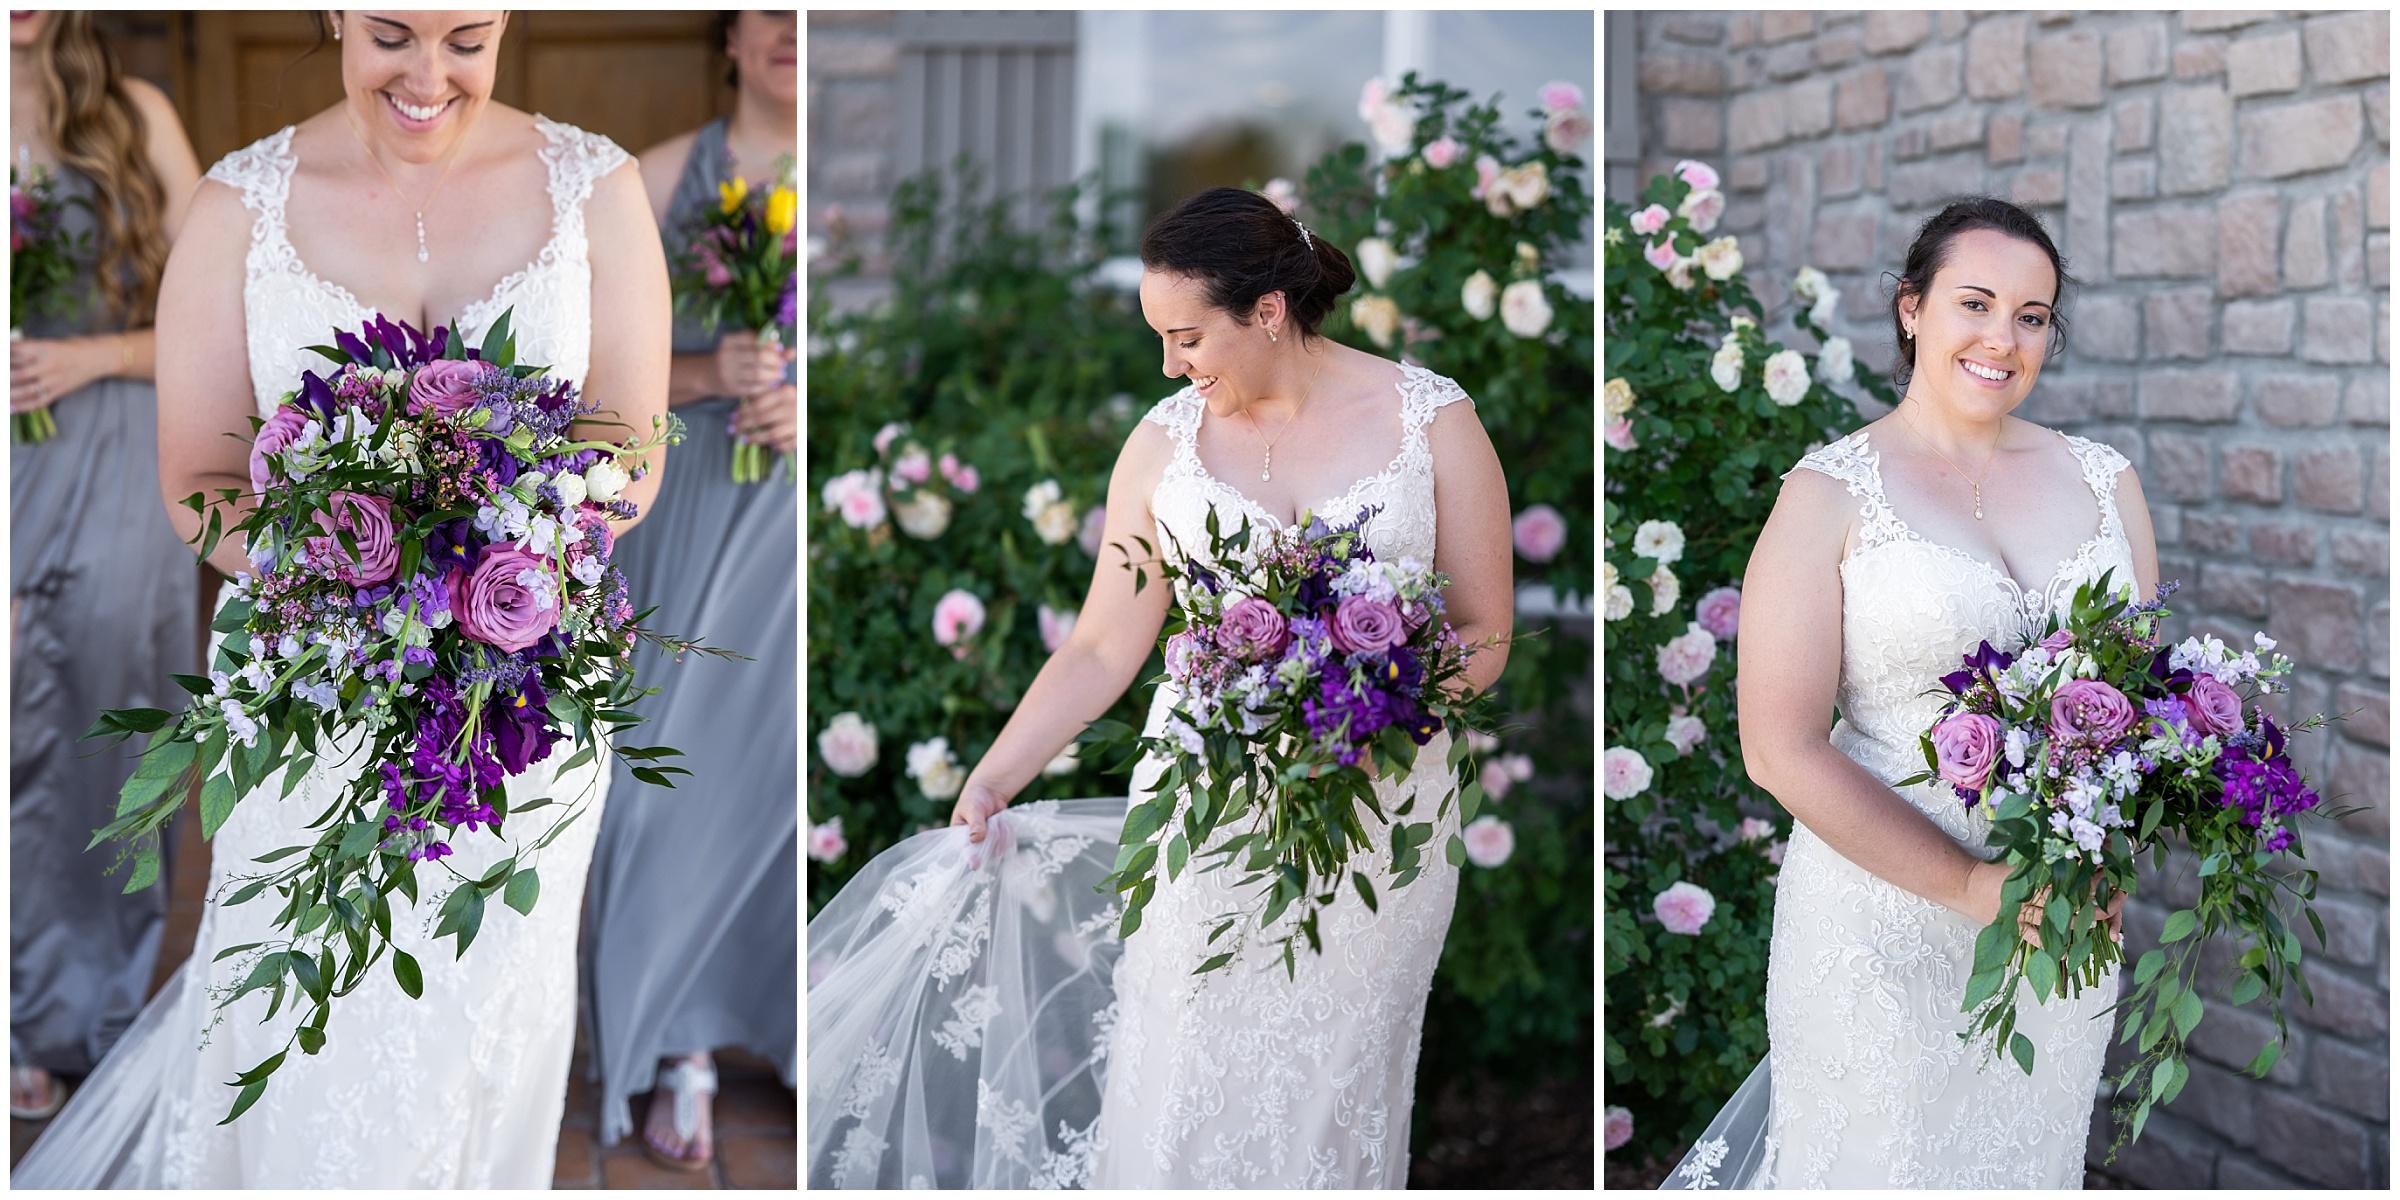 Grand Junction Wedding Photographer 0027.jpg